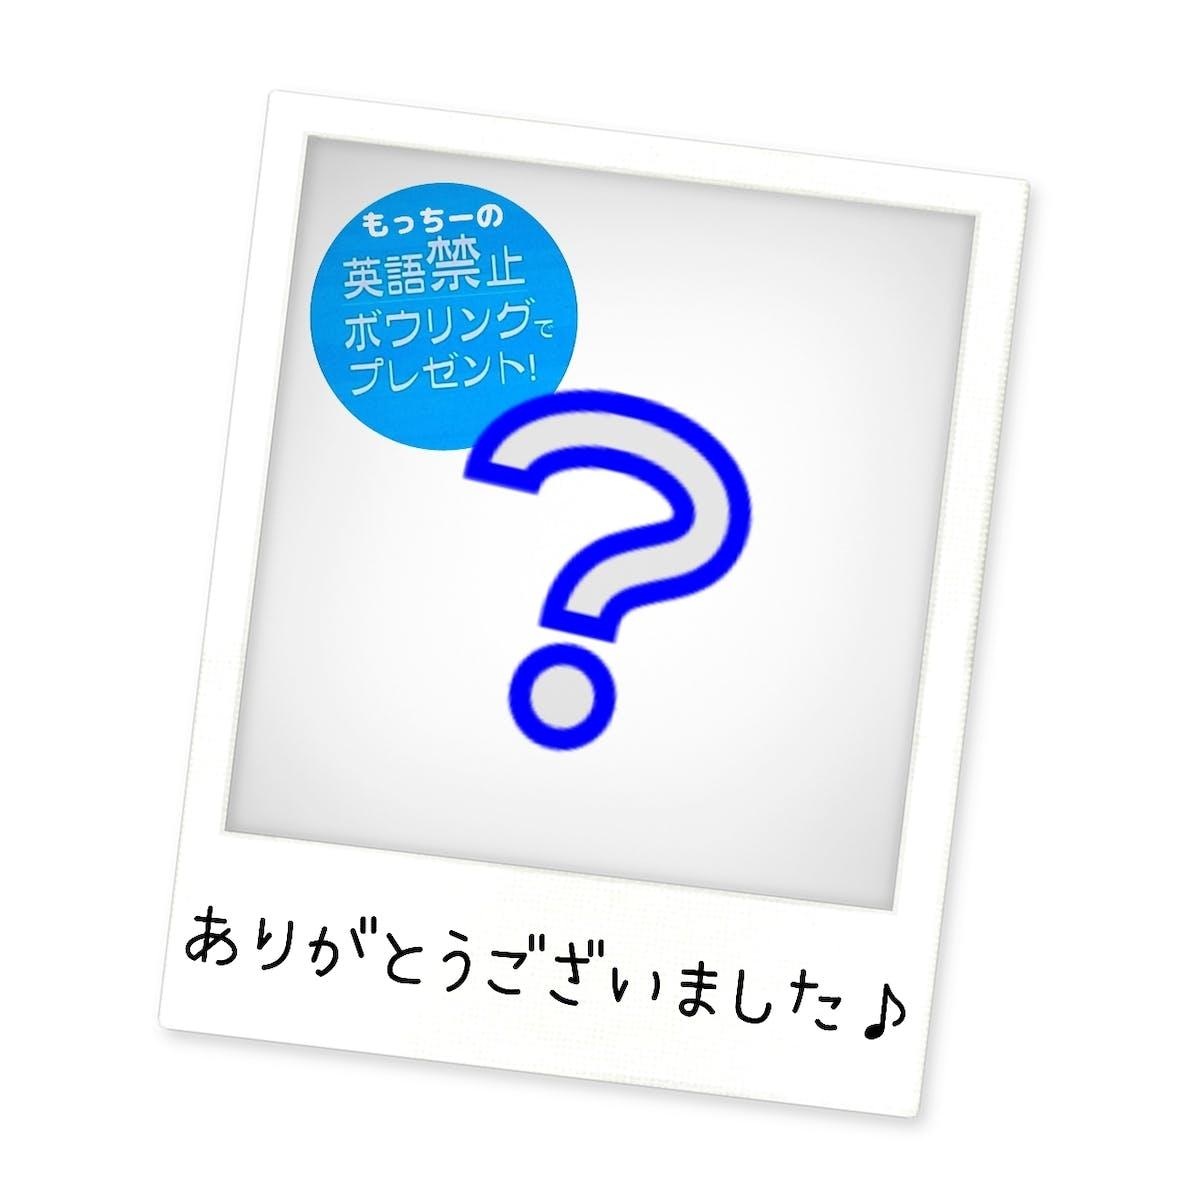 21-04-23-12-09-18-050_deco.jpg